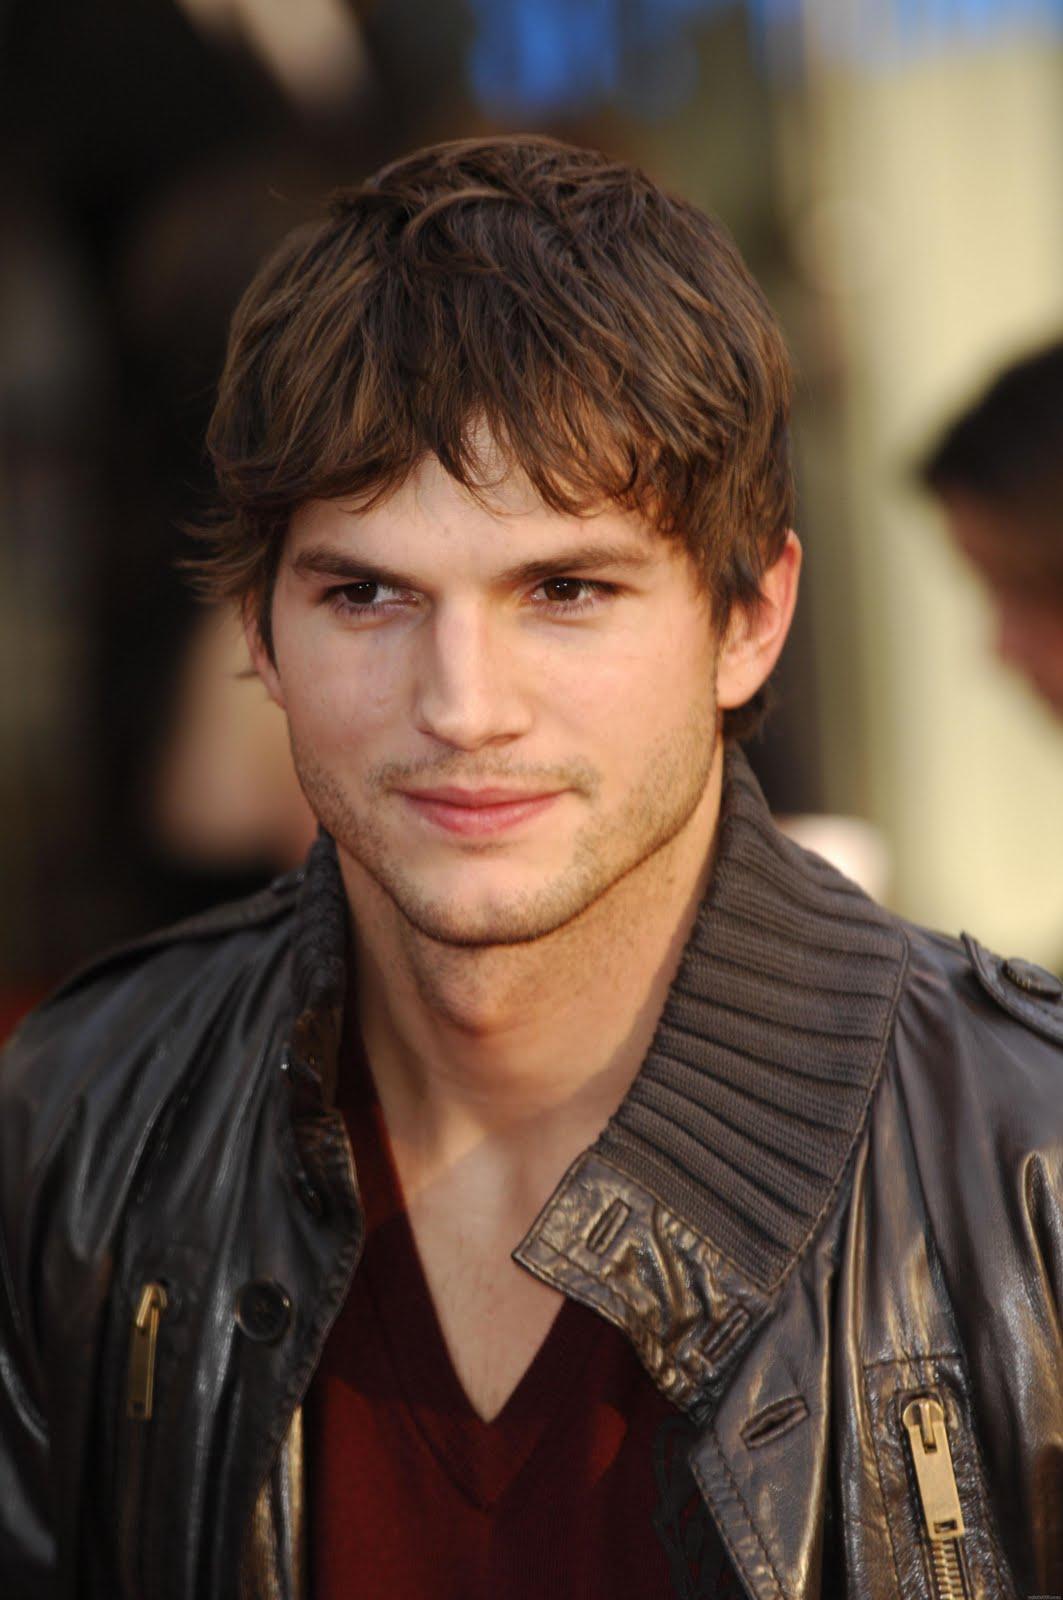 http://4.bp.blogspot.com/_MlfYmcD1nrA/TEC3cjpnP_I/AAAAAAAAAGk/nhGsAPmSJyk/s1600/Ashton_Kutcher_76.jpg